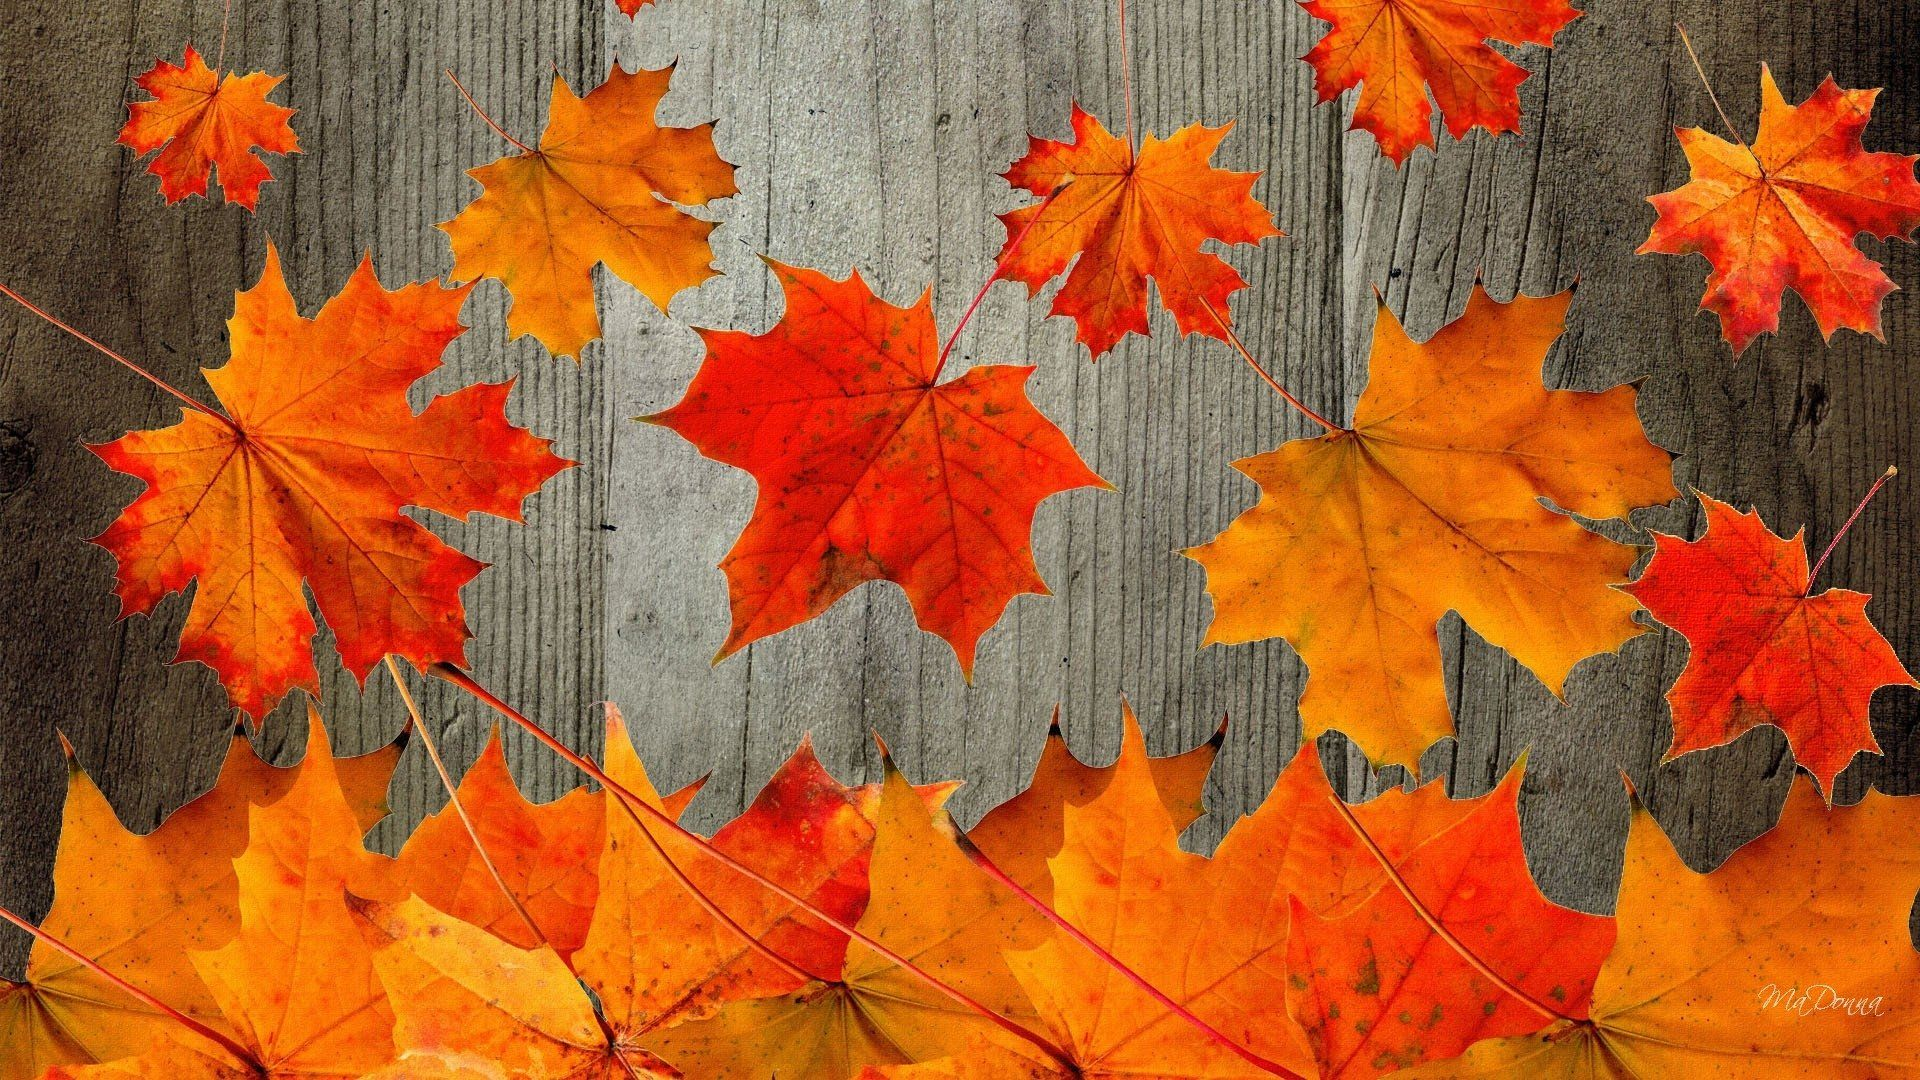 Fall Desktop Wallpapers Top Free Fall Desktop Backgrounds